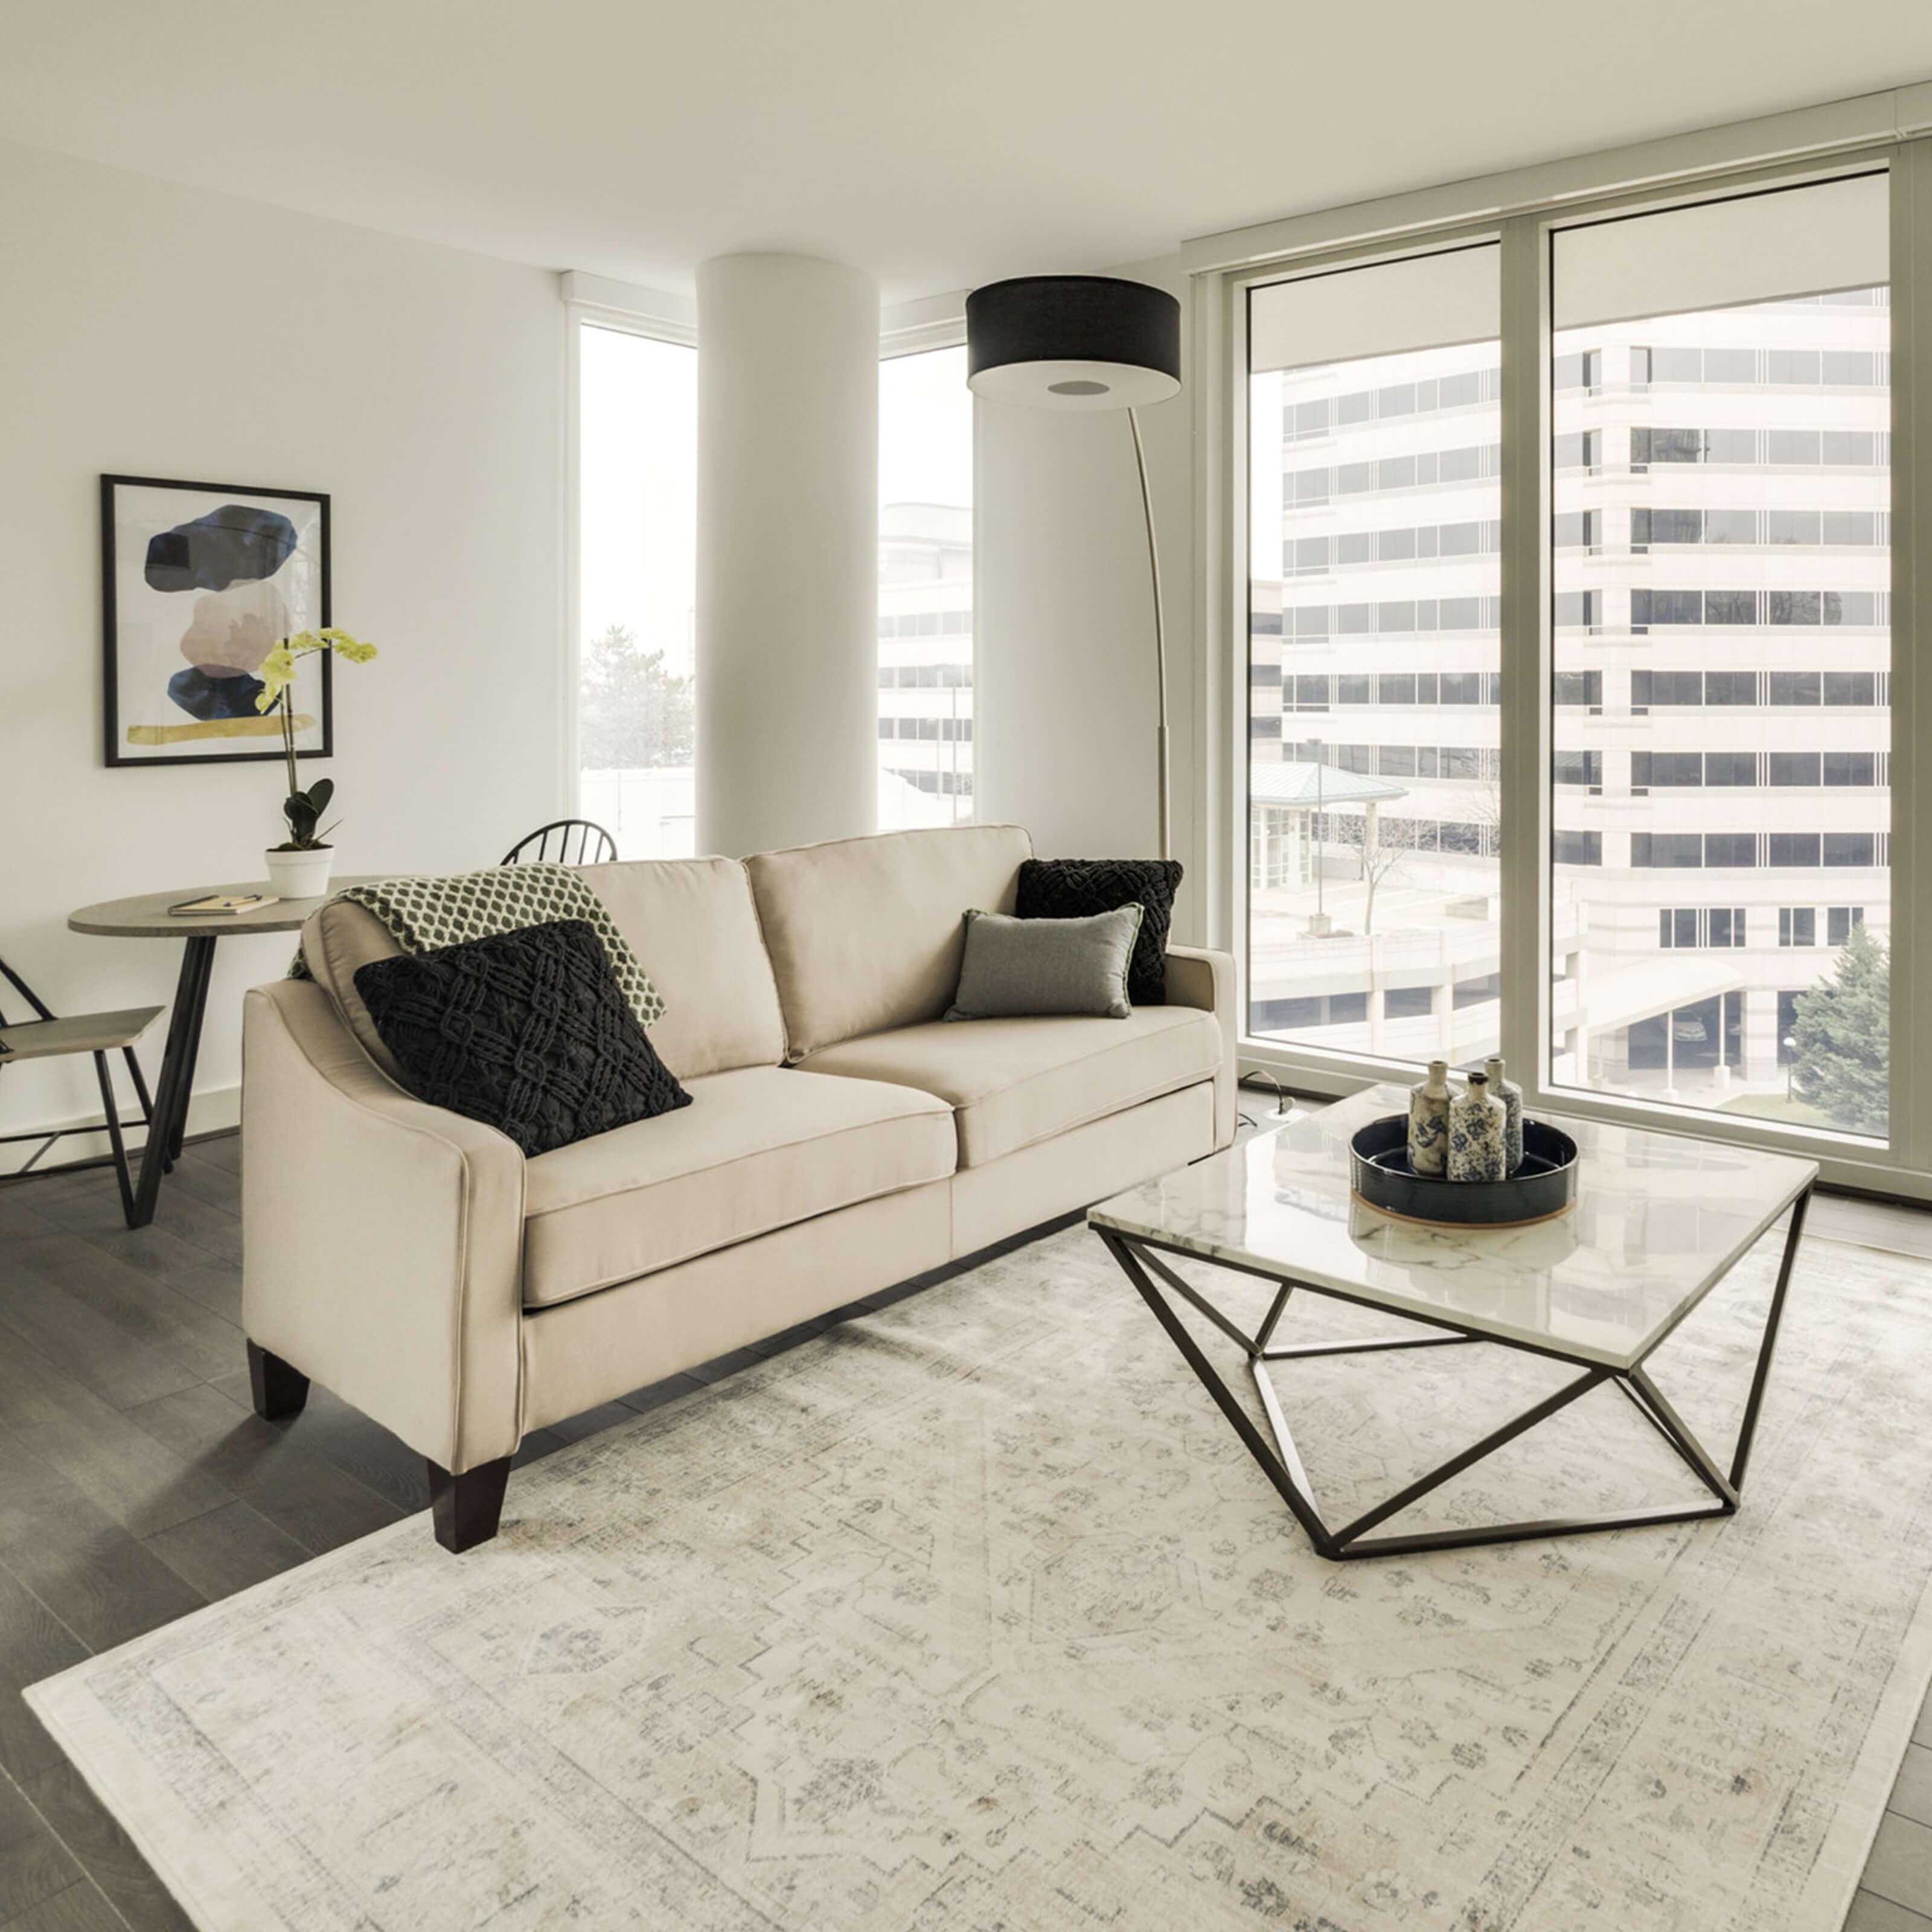 zeus studio apartment central space